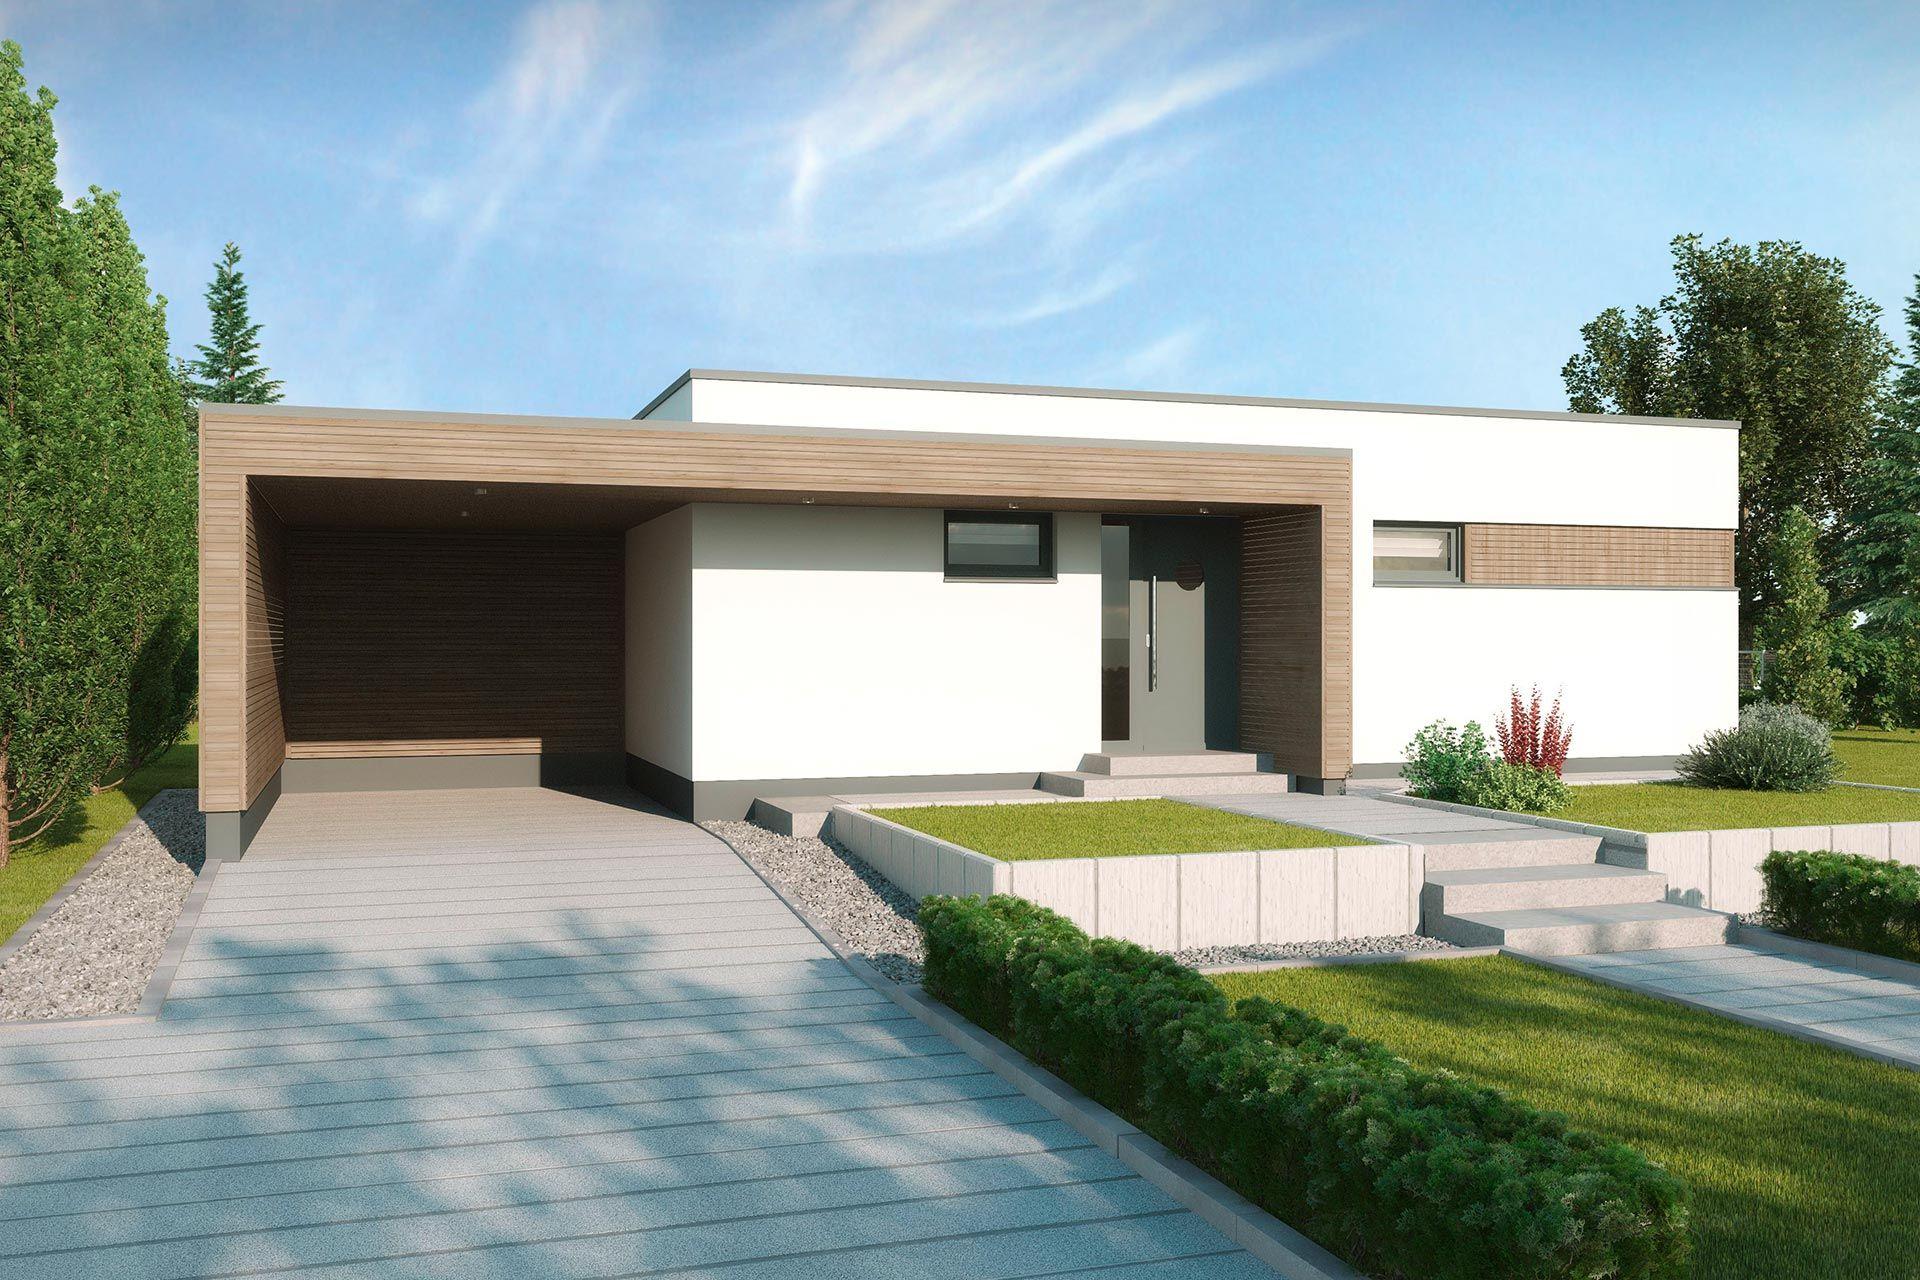 Modernes holzhaus flachdach  Bungalow | Moderne Häuser | Pinterest | Moderne häuser ...